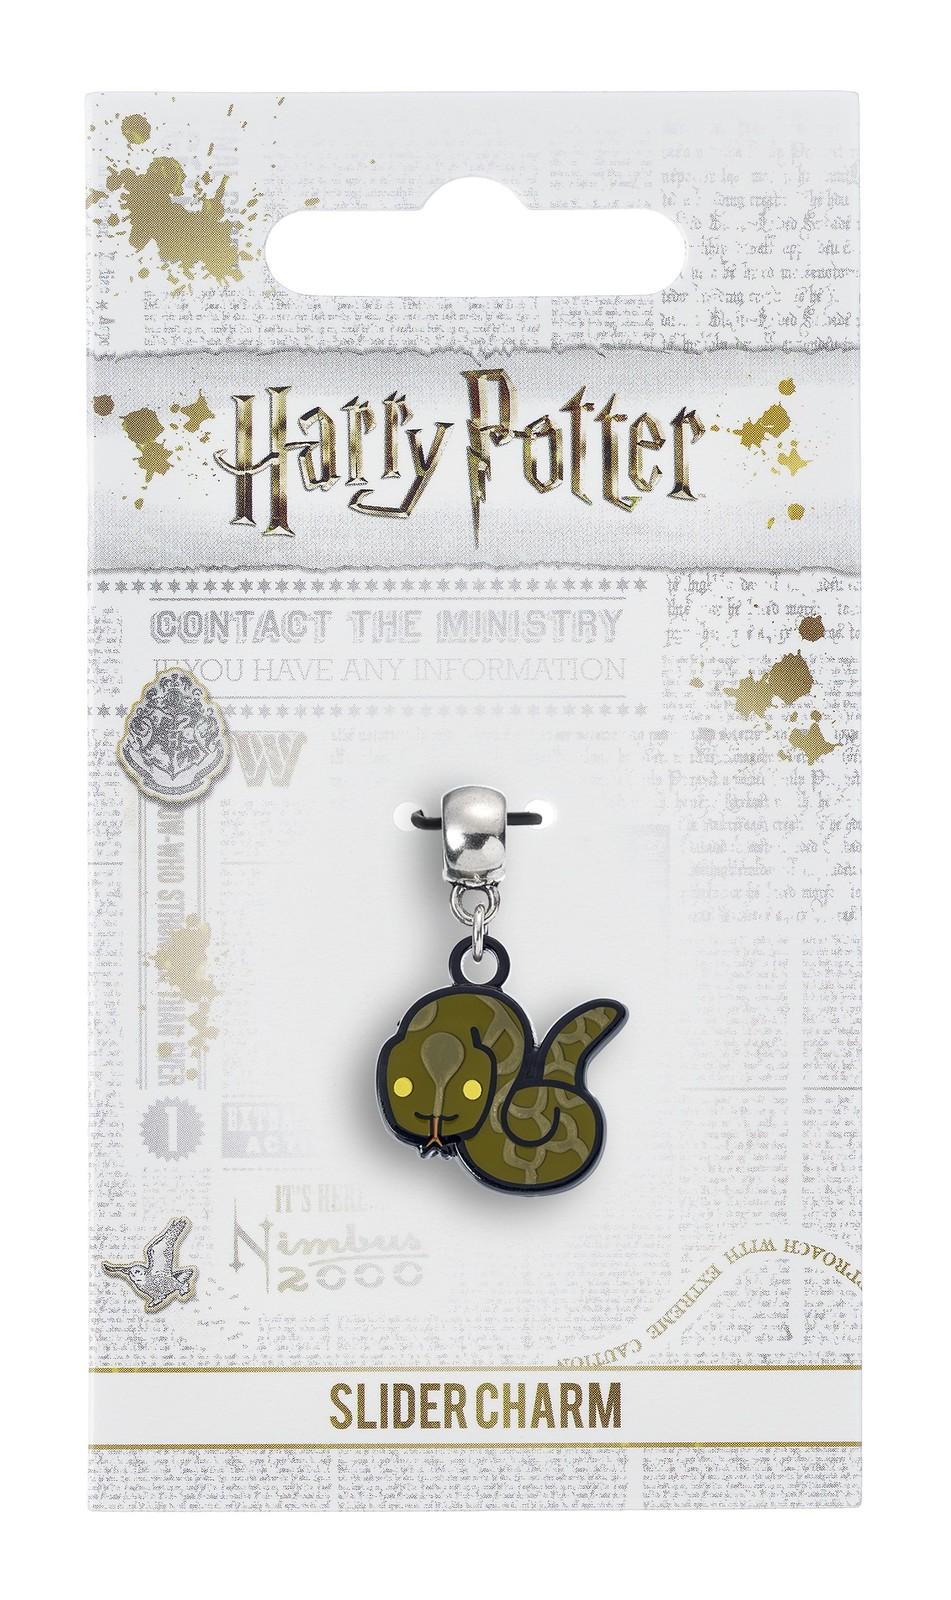 Harry Potter: Nagini Slider Charm image